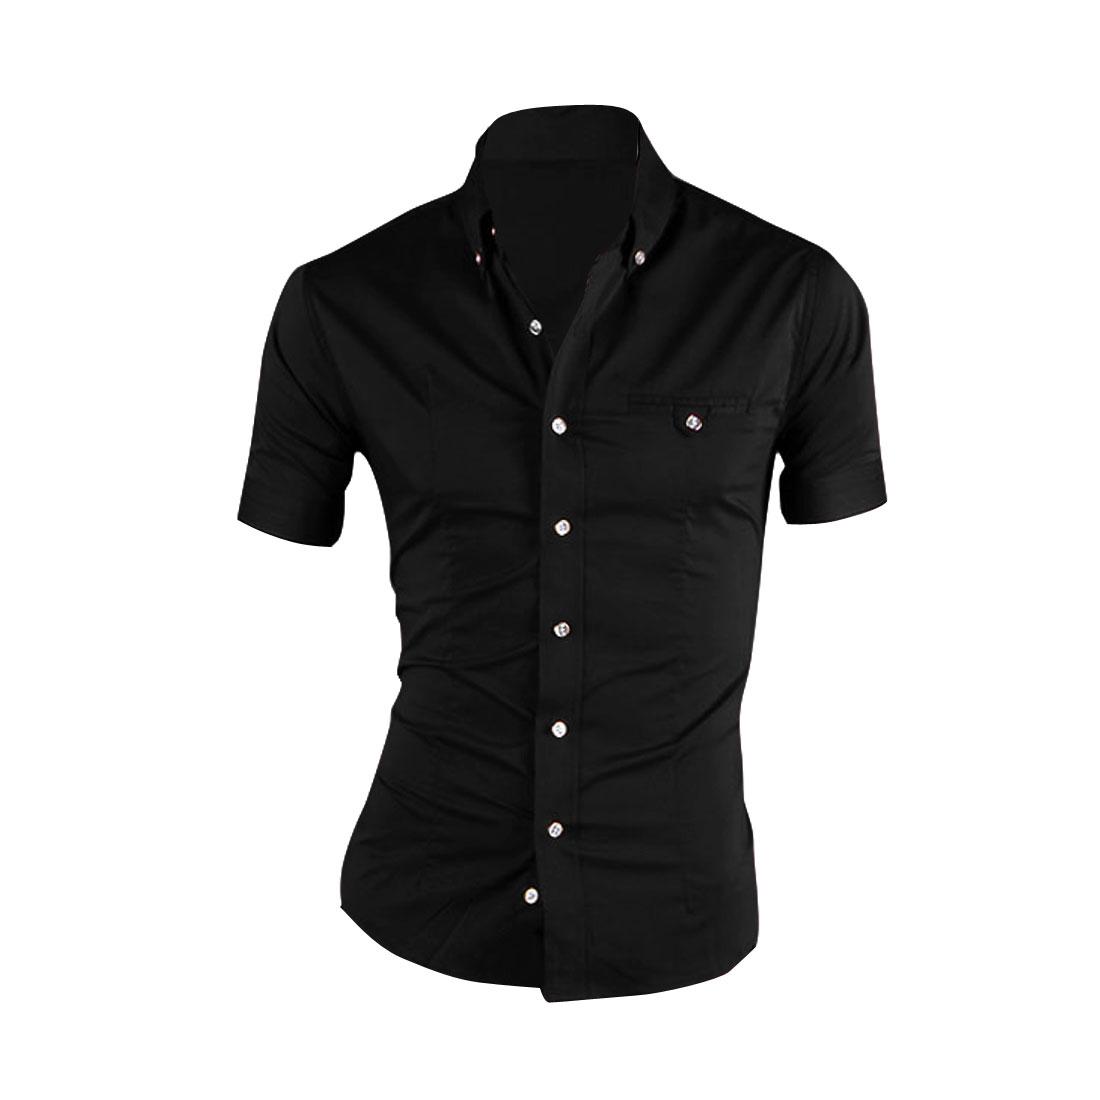 Man Chest Pocket Decor Plaids Buttoned Cuff Stylish Shirt Black M